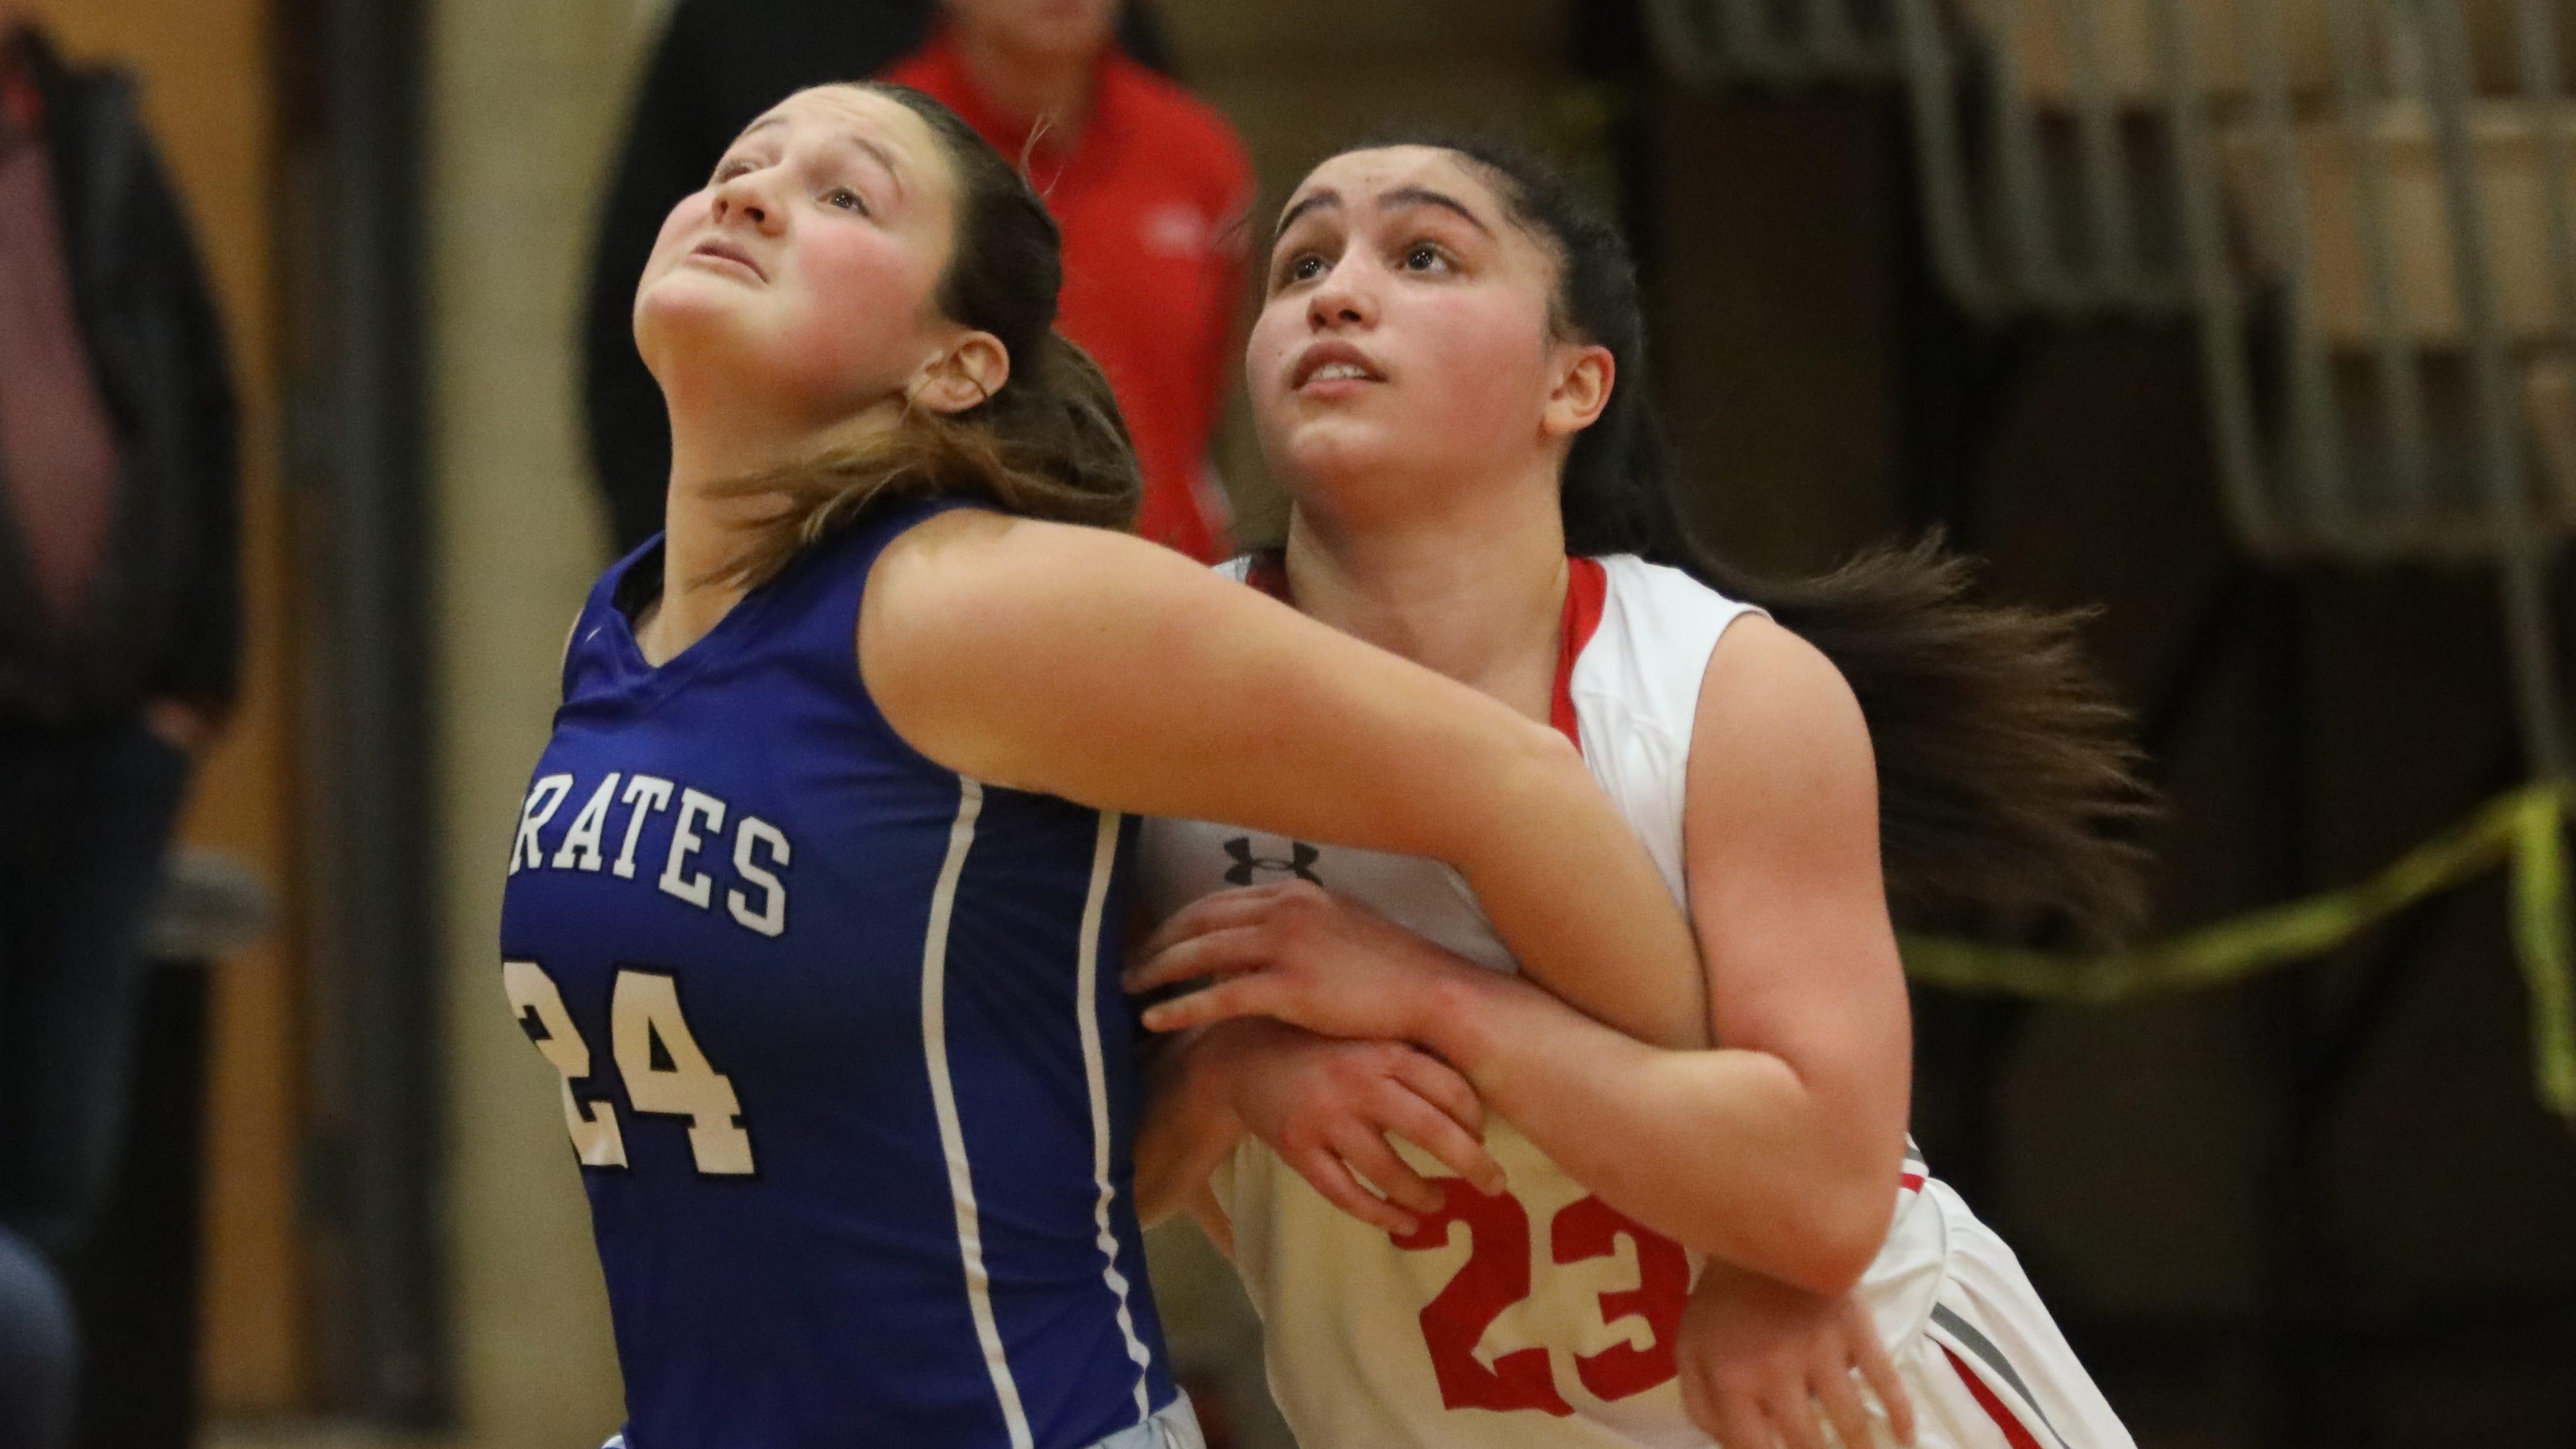 Tappan Zee defeats Pearl River 54-53 during girls basketball game at Tappan Zee High School in Orangeburg on Jan. 14, 2019.